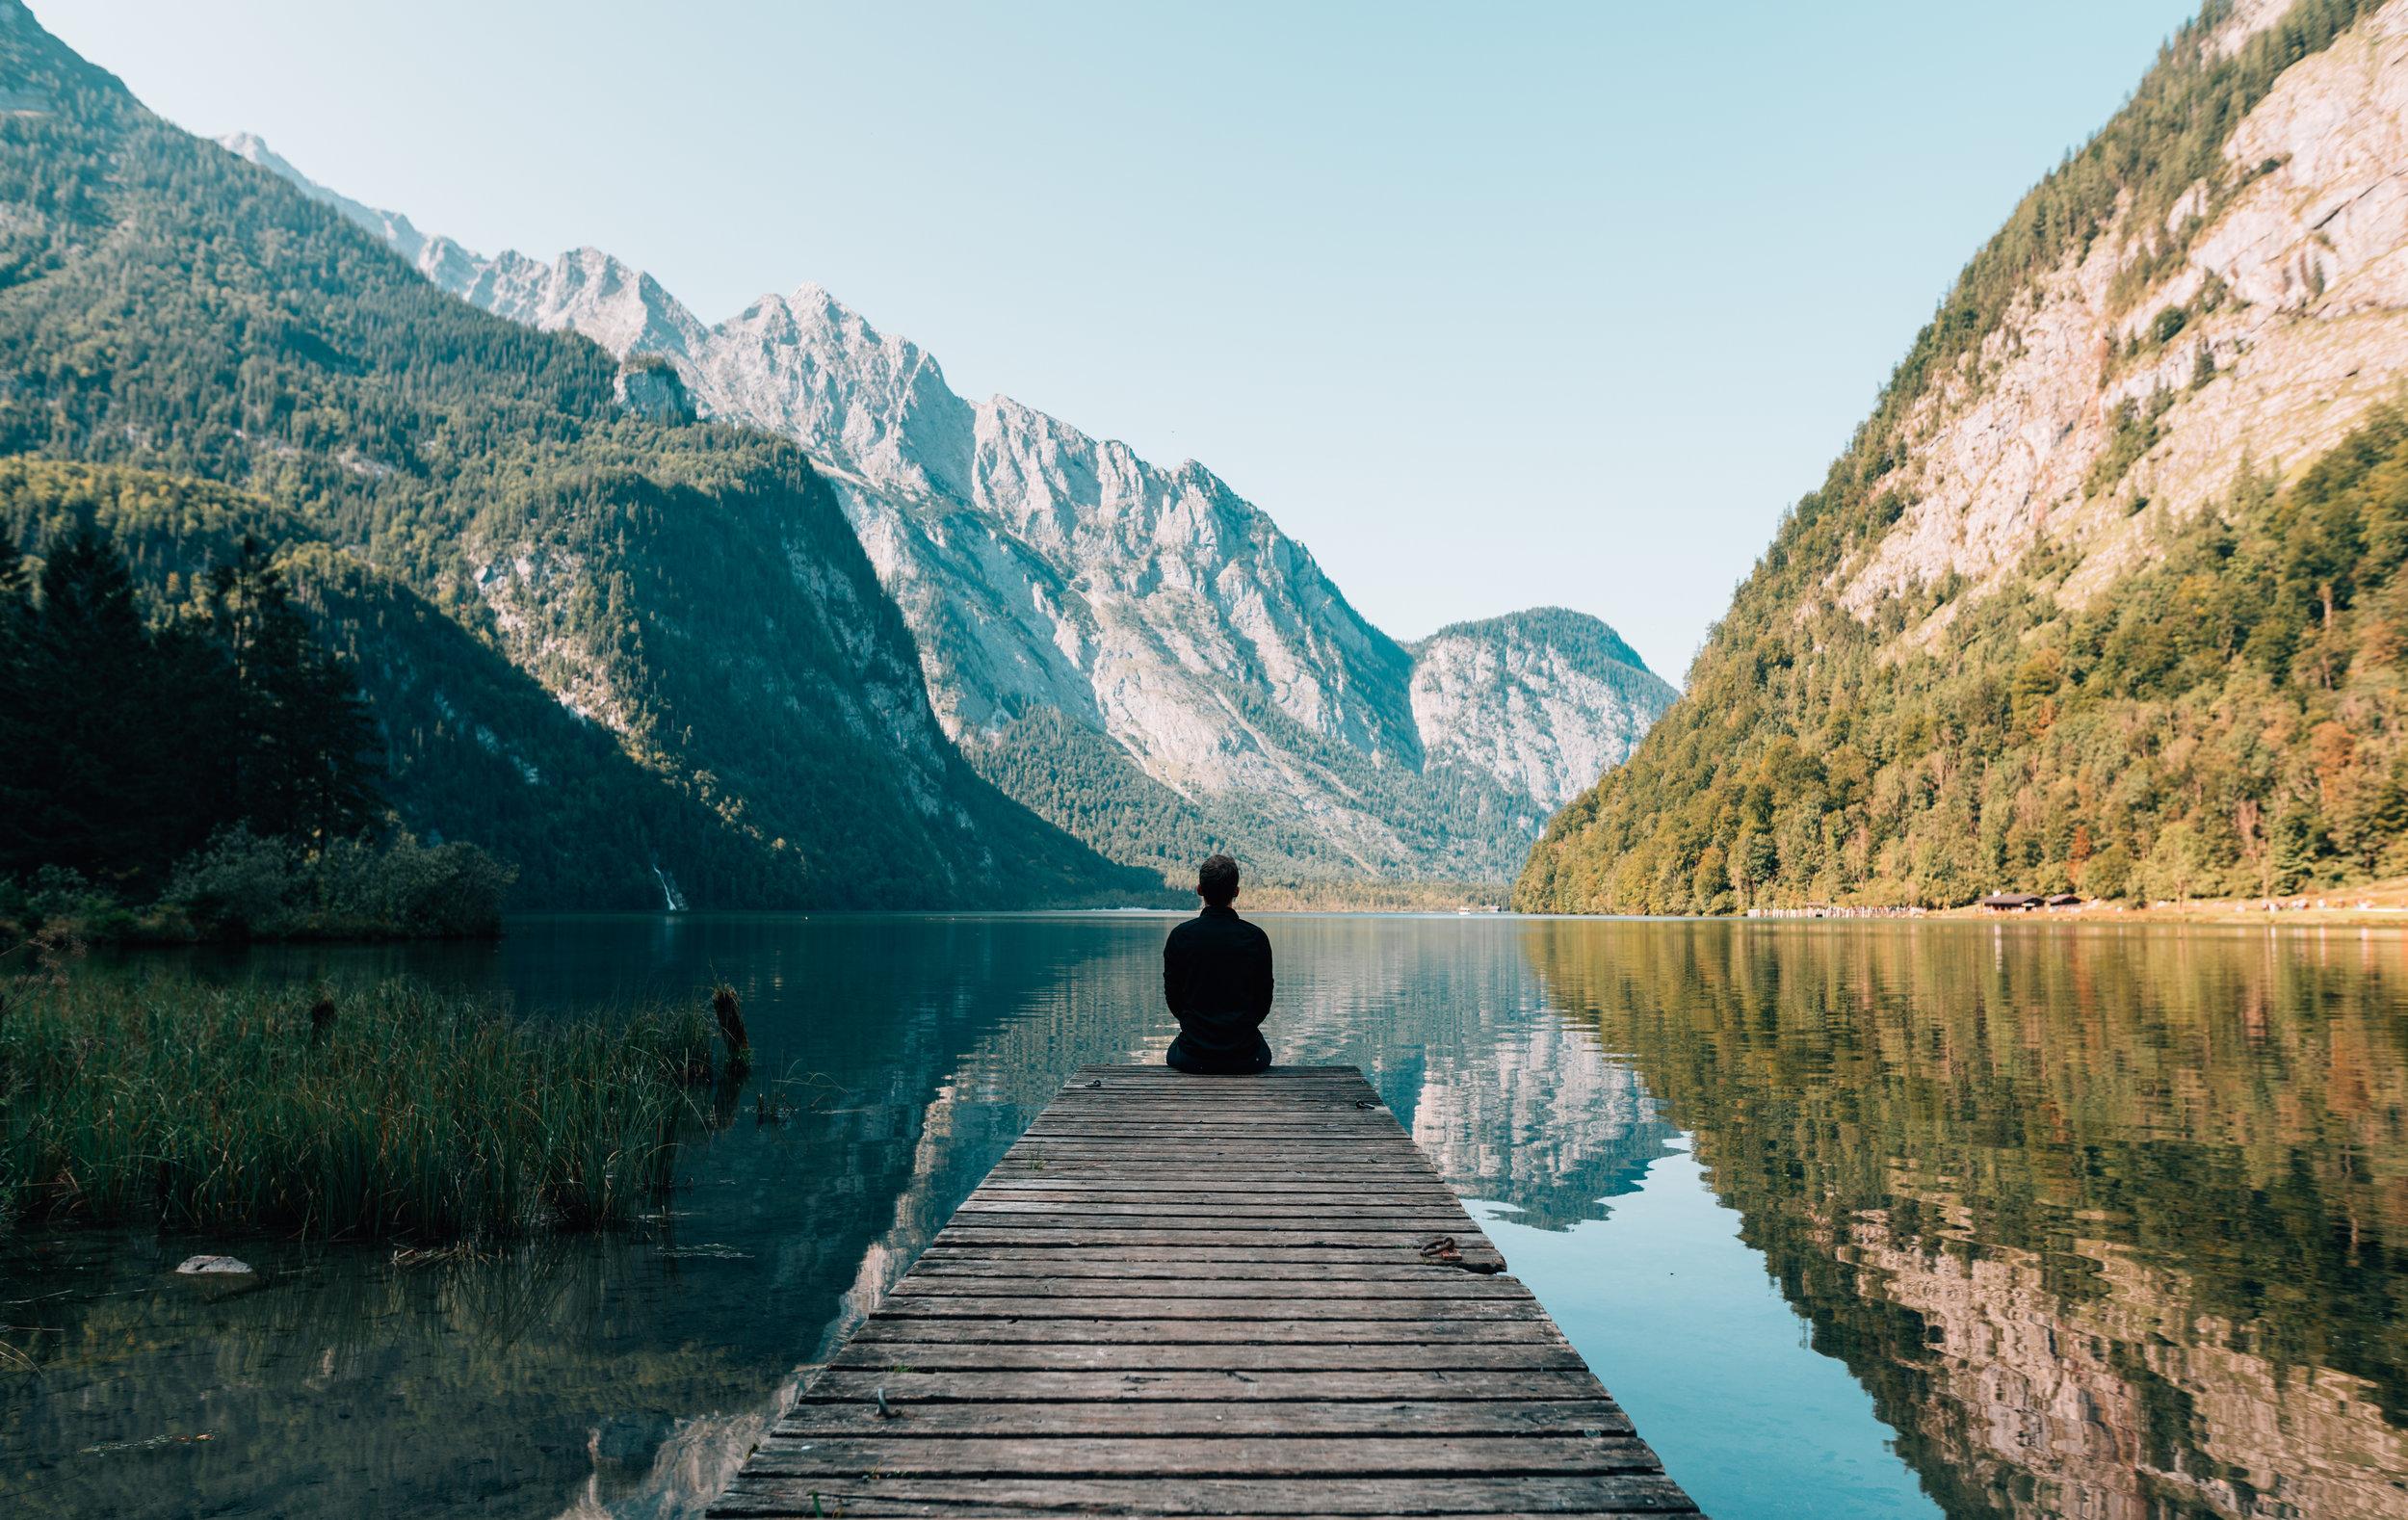 meditation mindful nature cure